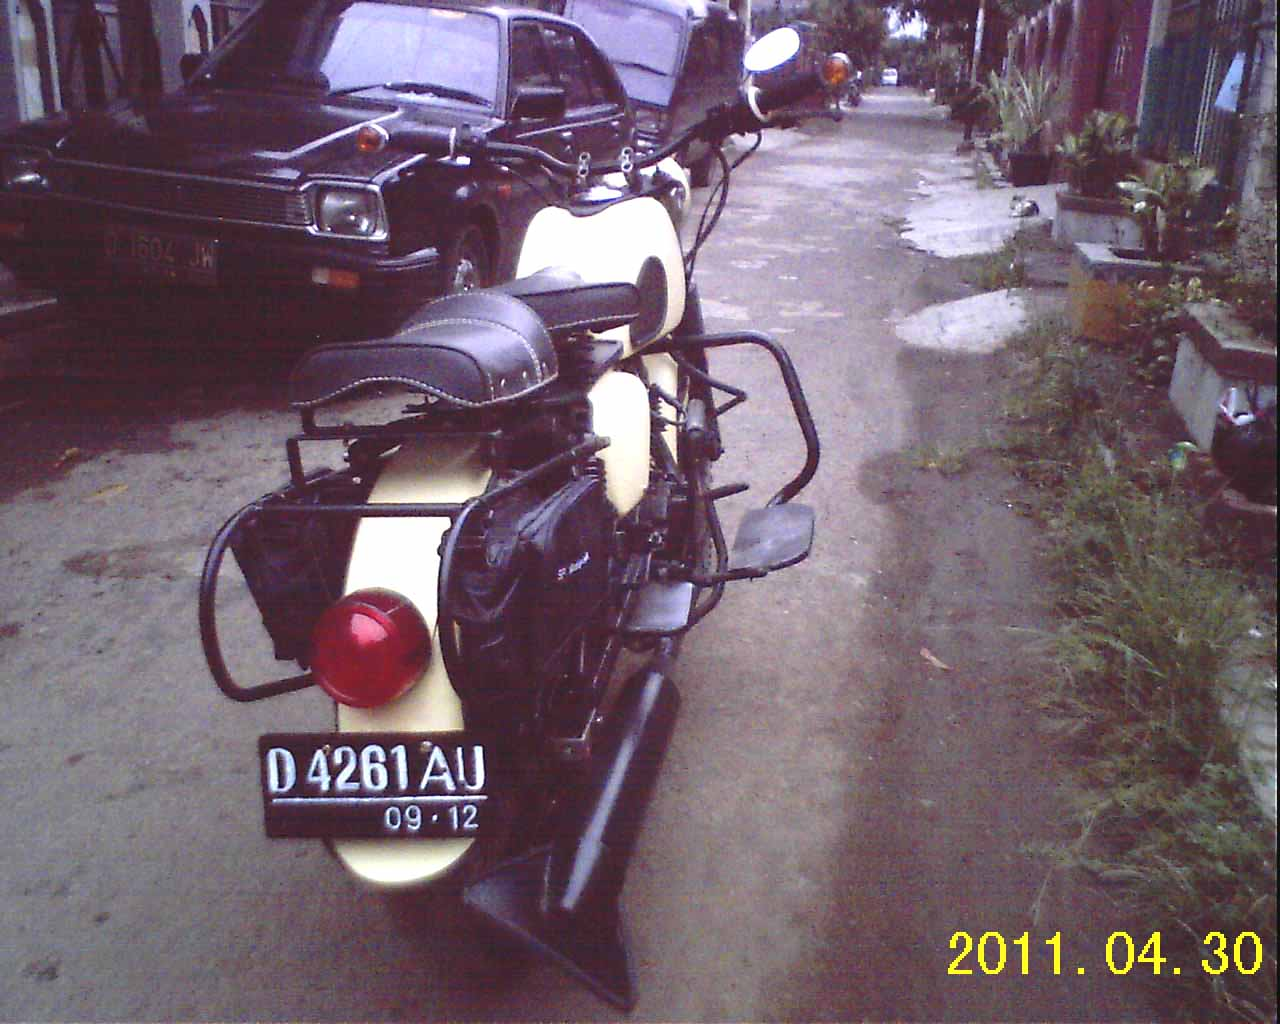 Modif Yamaha L2g